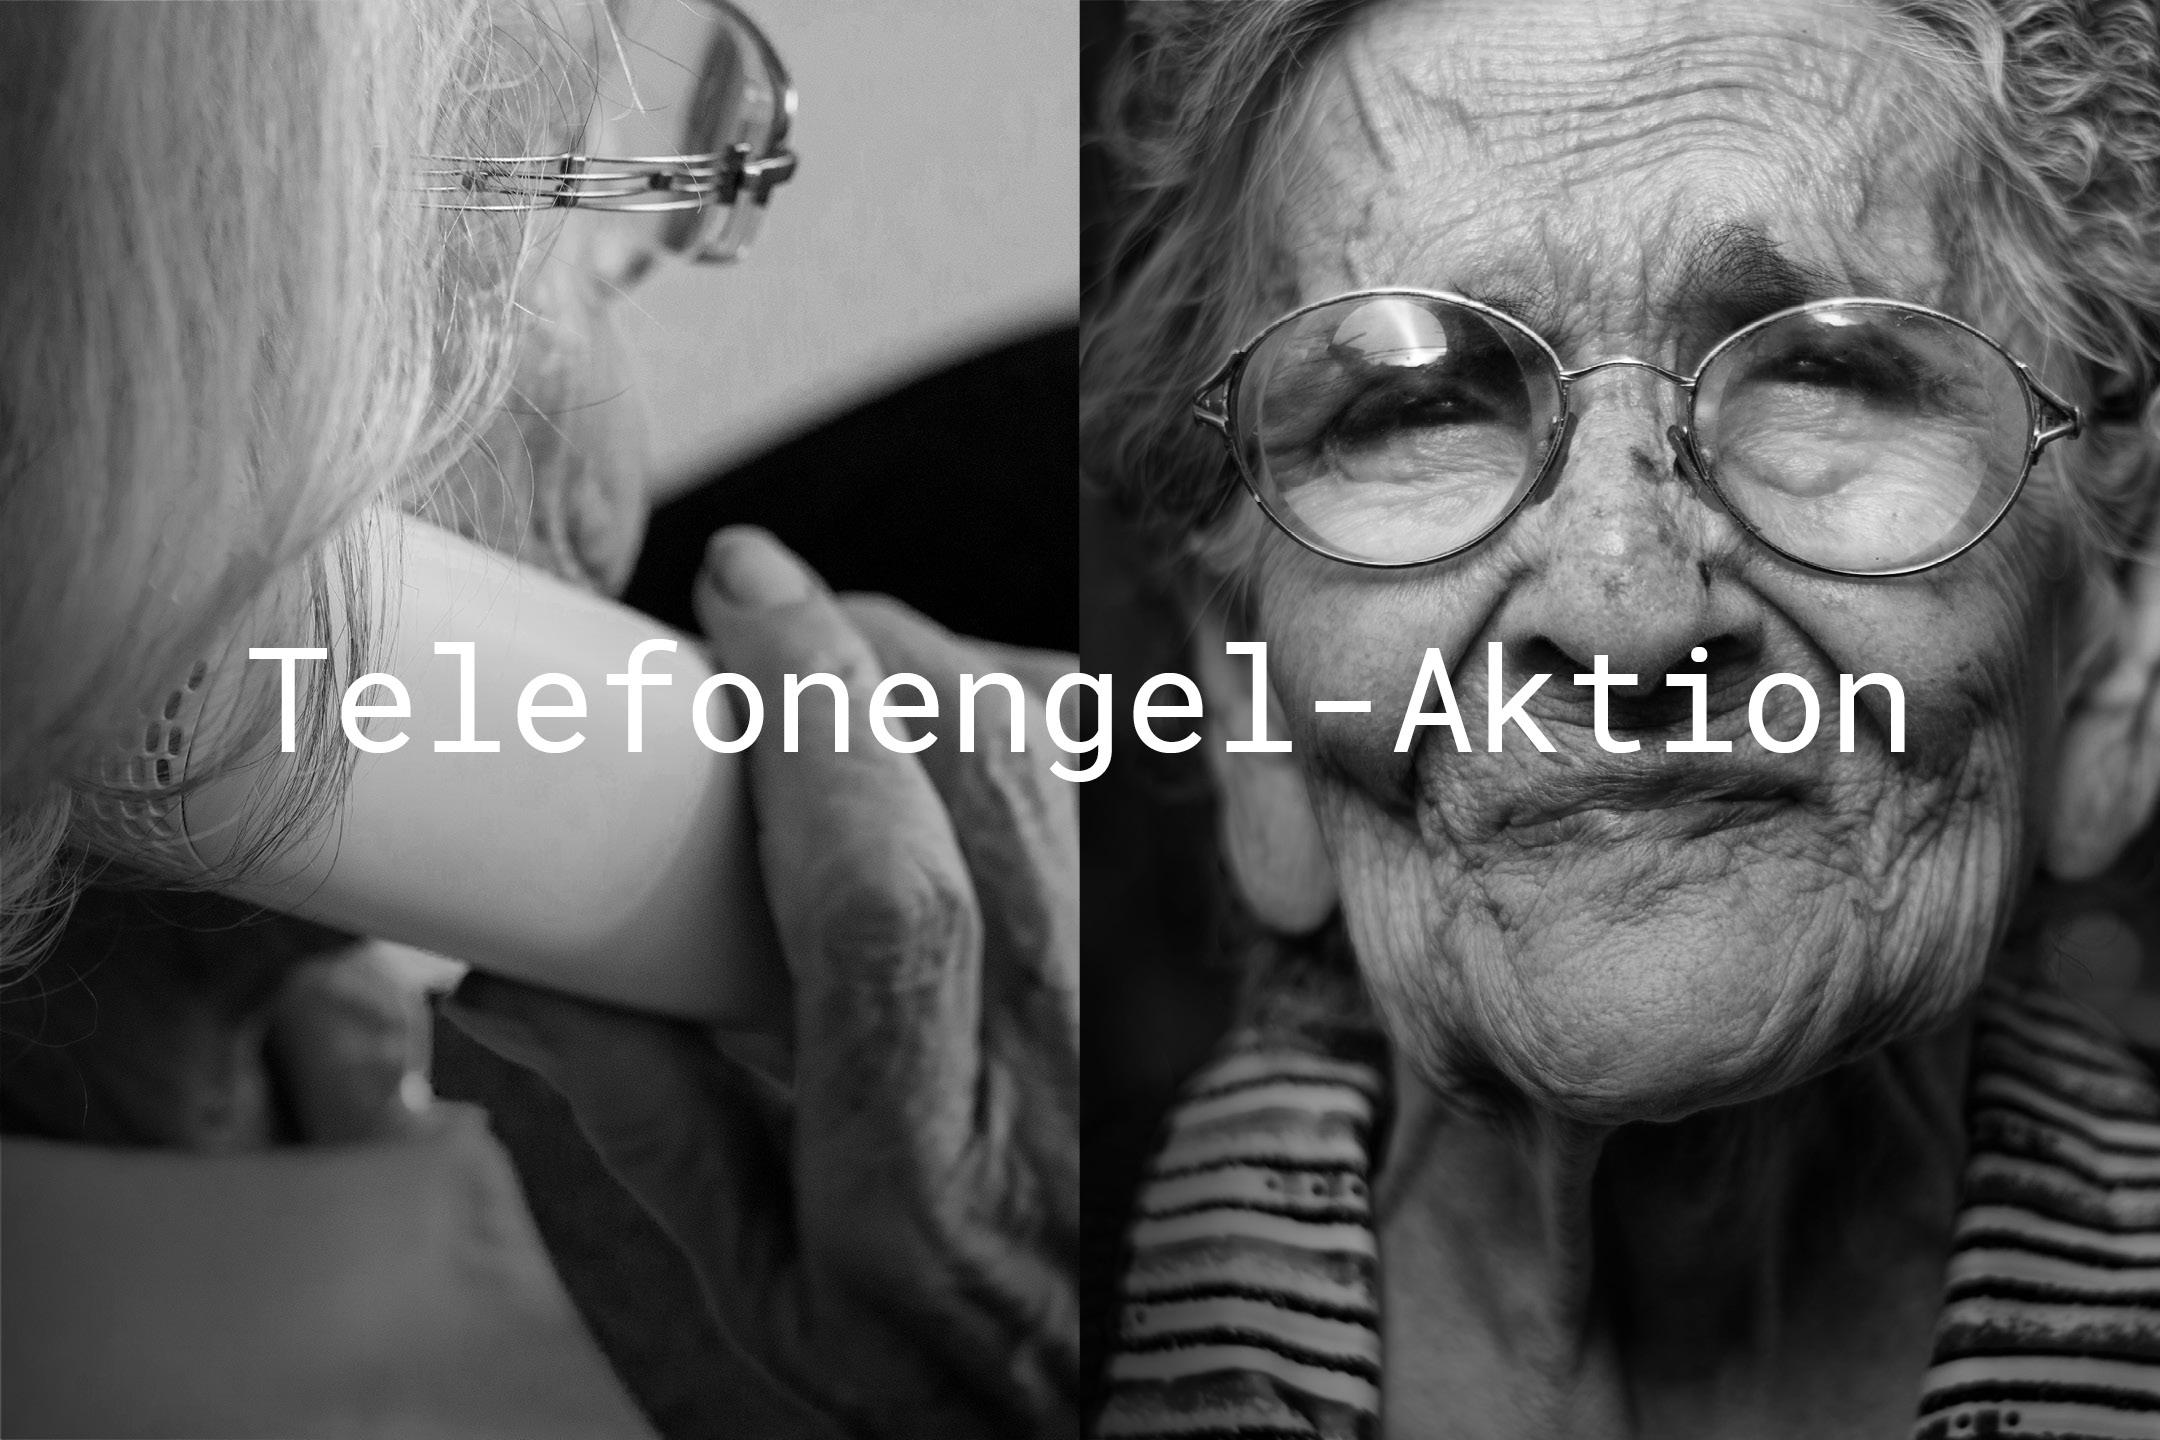 Retla Telefonengel - Image